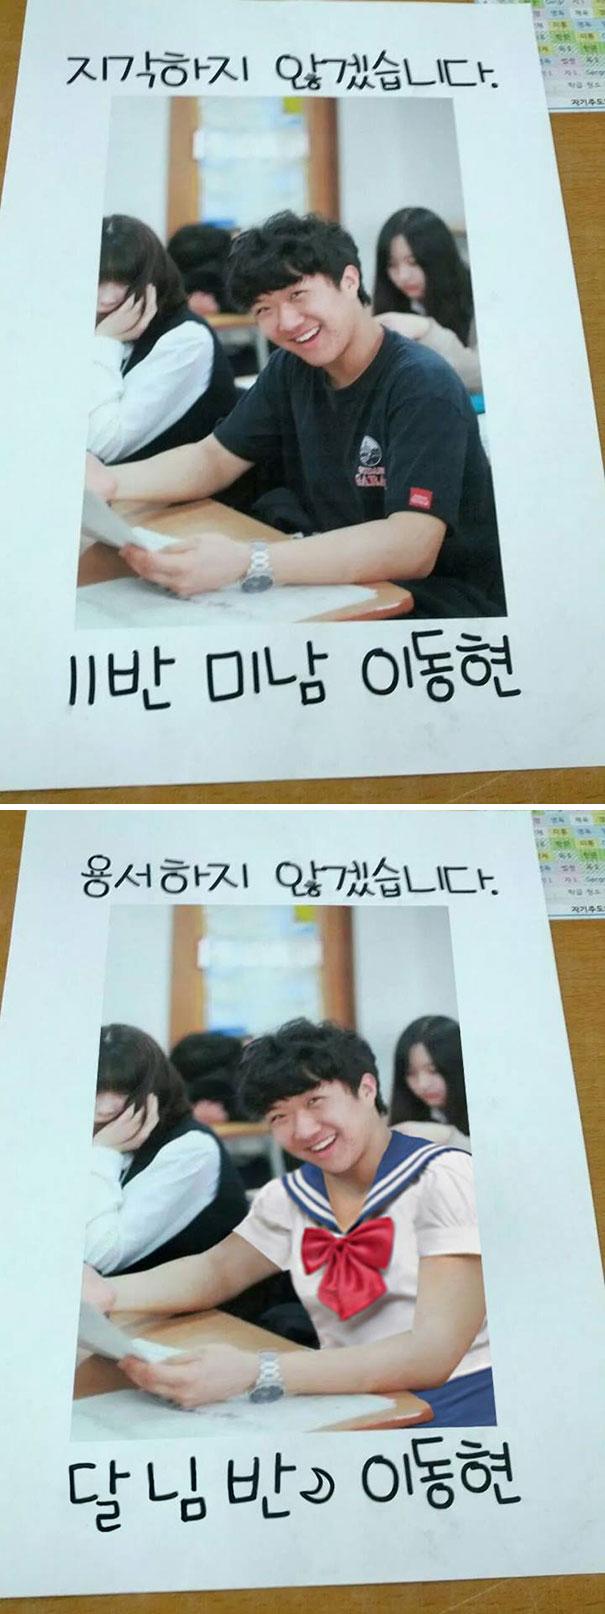 korean-photoshop-trolls-592e7441c9a9c__605